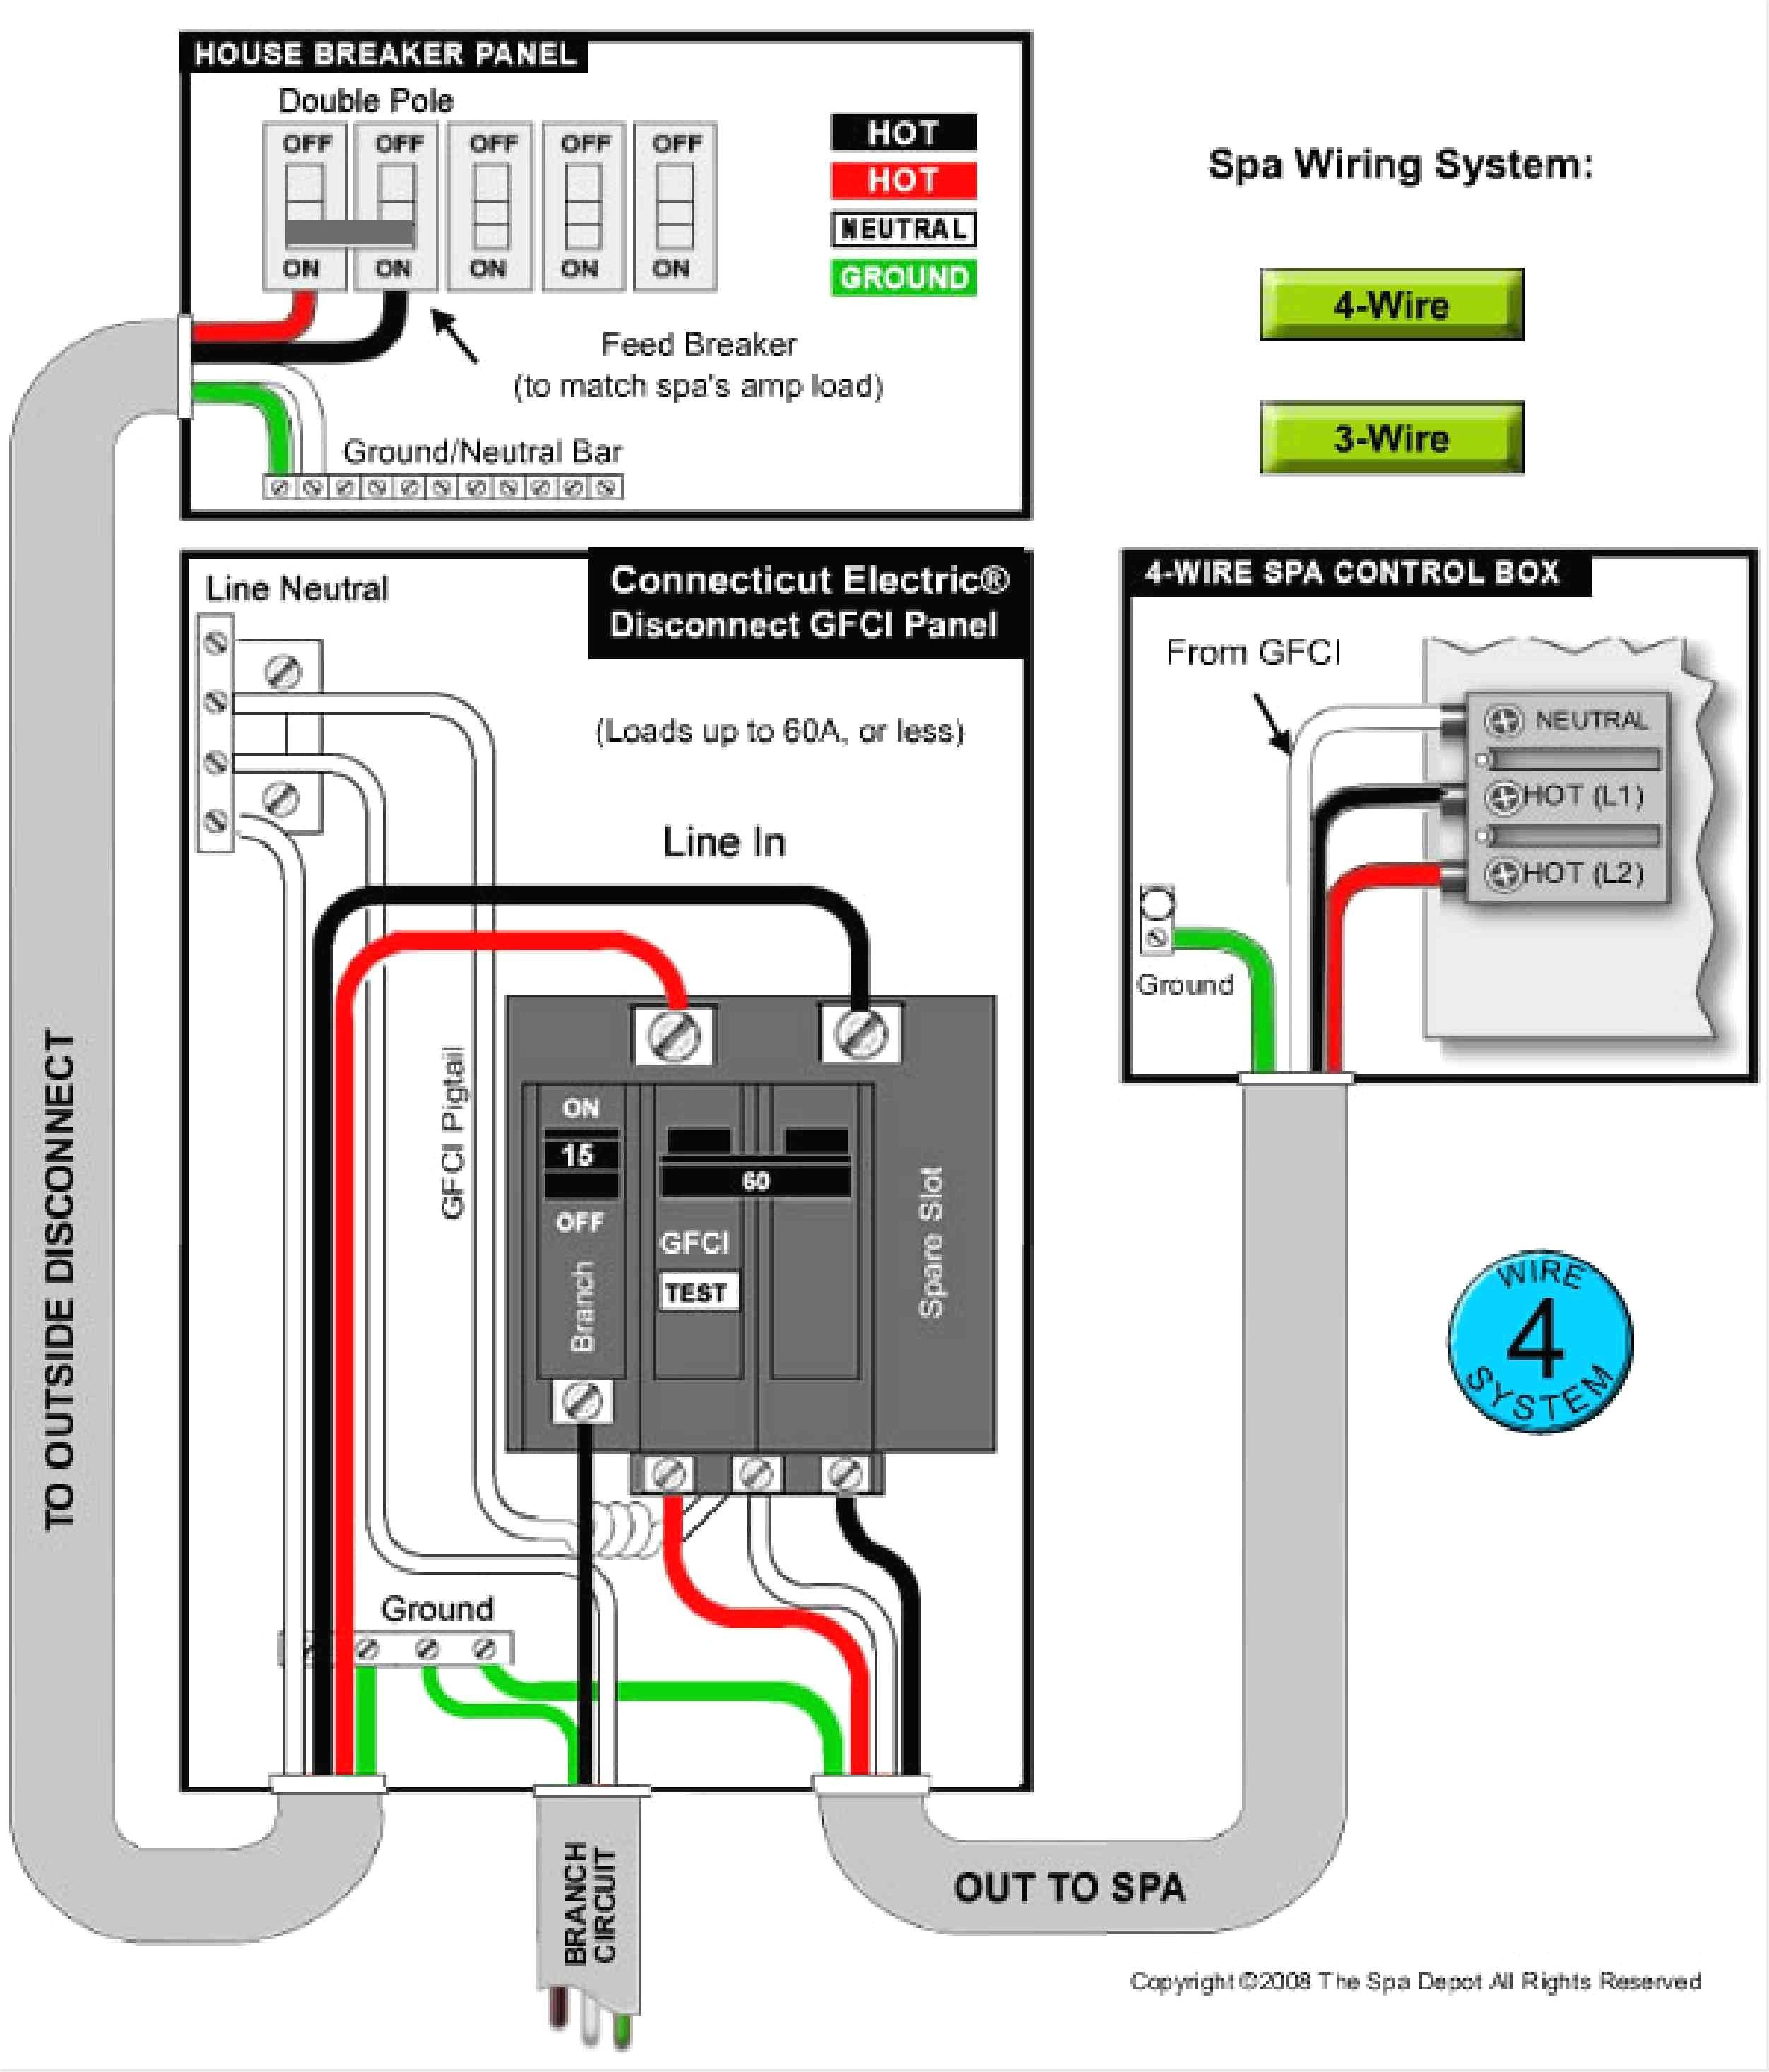 Amp Square D Gfci Breaker Wiring Diagram Pole Gfci Breaker Wiring Diagram Fresh Gfi Box Square D Amp Q